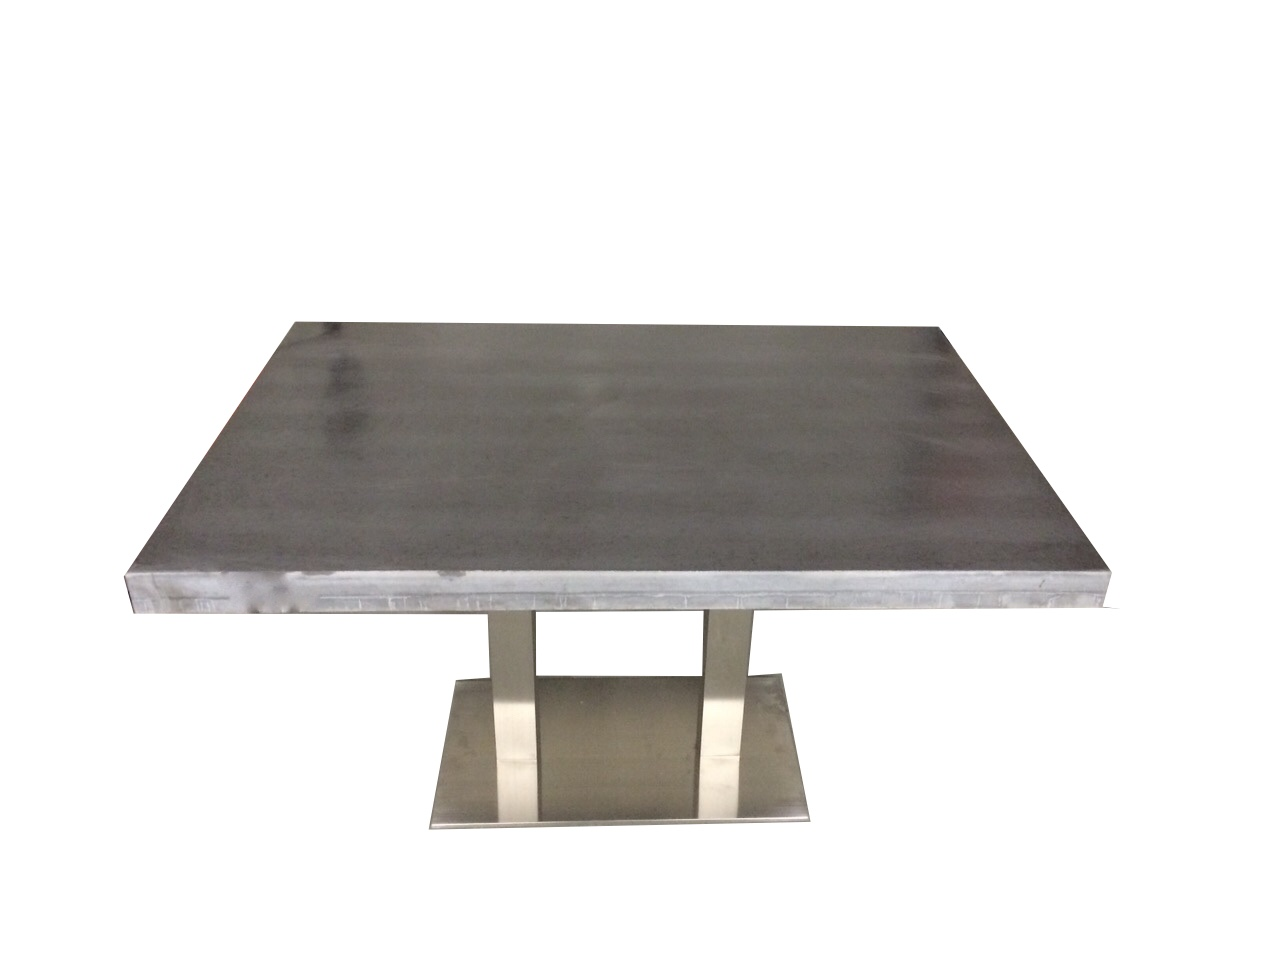 Rvs Onderstel Tafel : Betonlook tafel met rvs onderstel beton ciré centrum